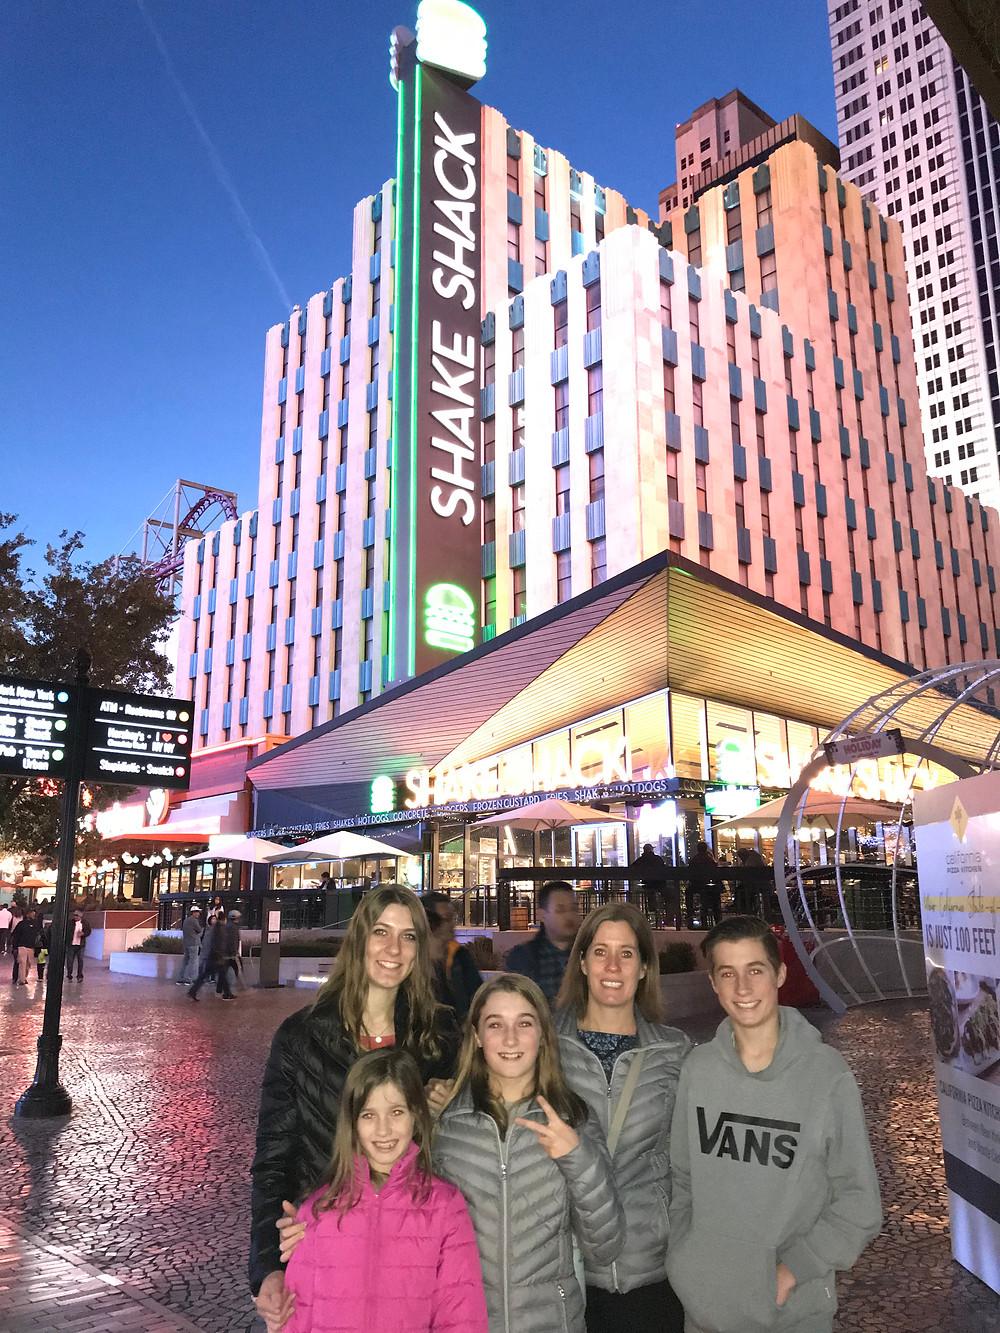 Shake Shack at the New York New York hotel in Las Vegas